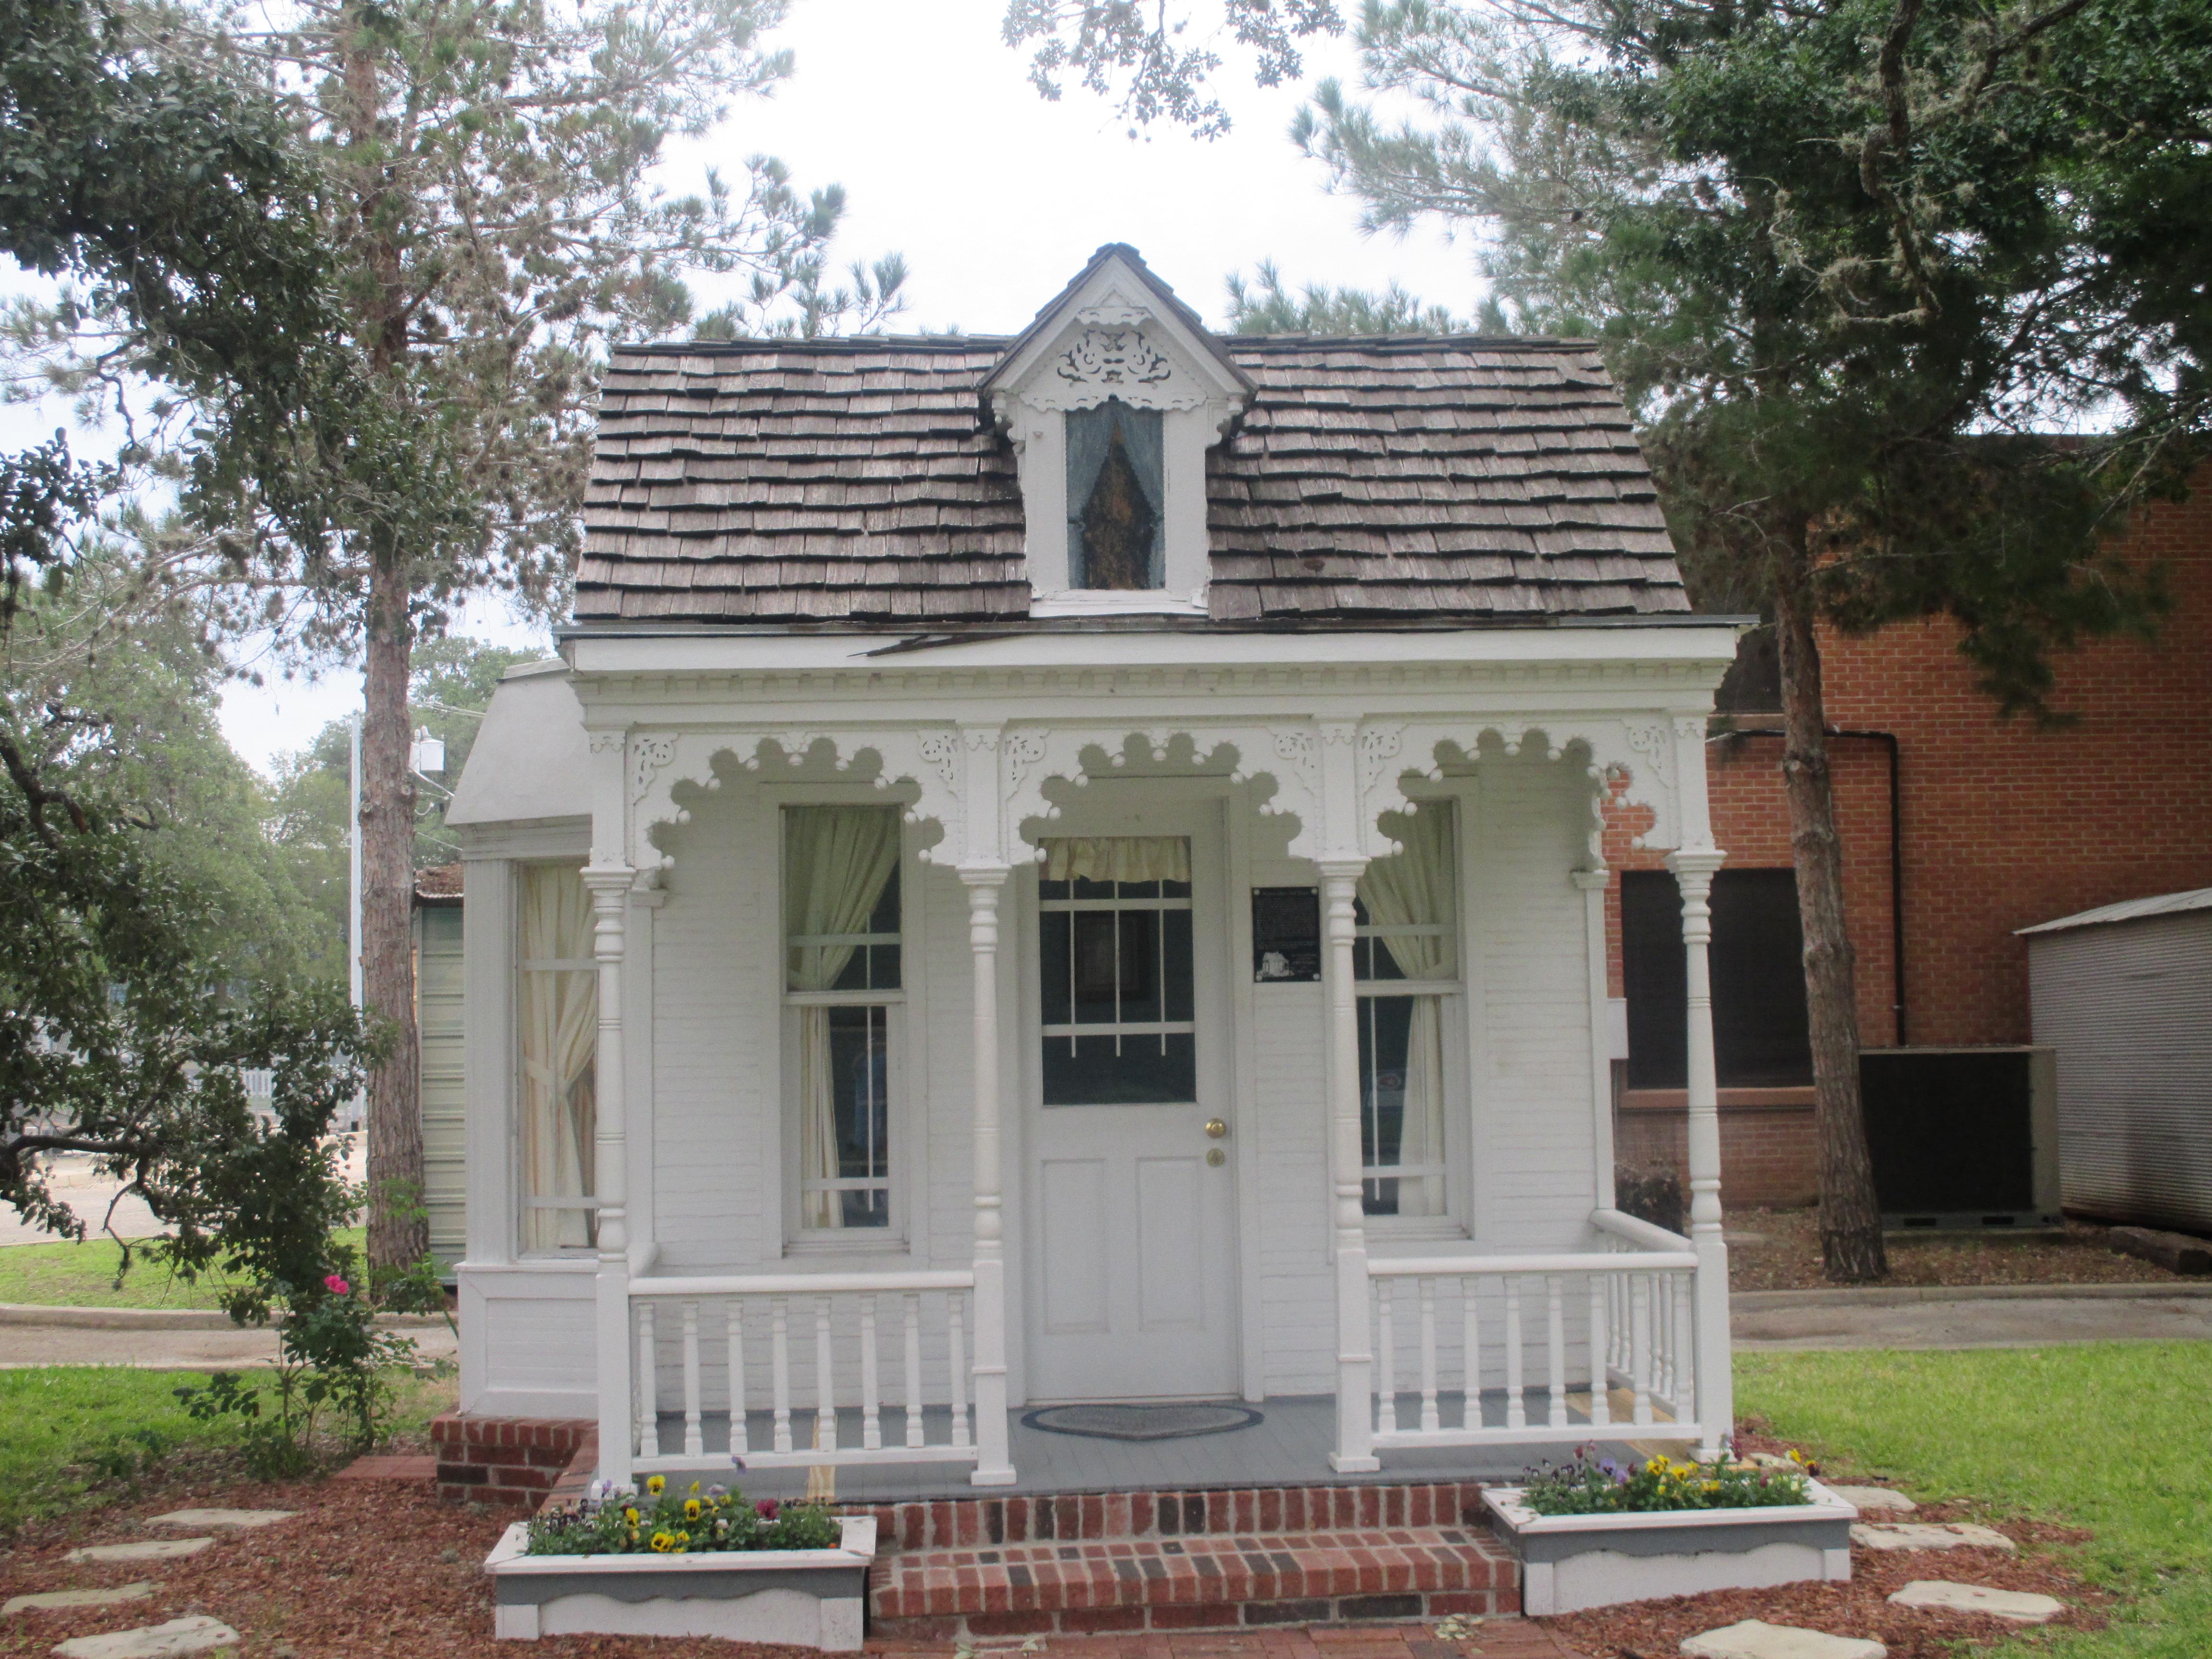 File:Historic Dietz-Castilla Doll House, Seguin, TX IMG 8170